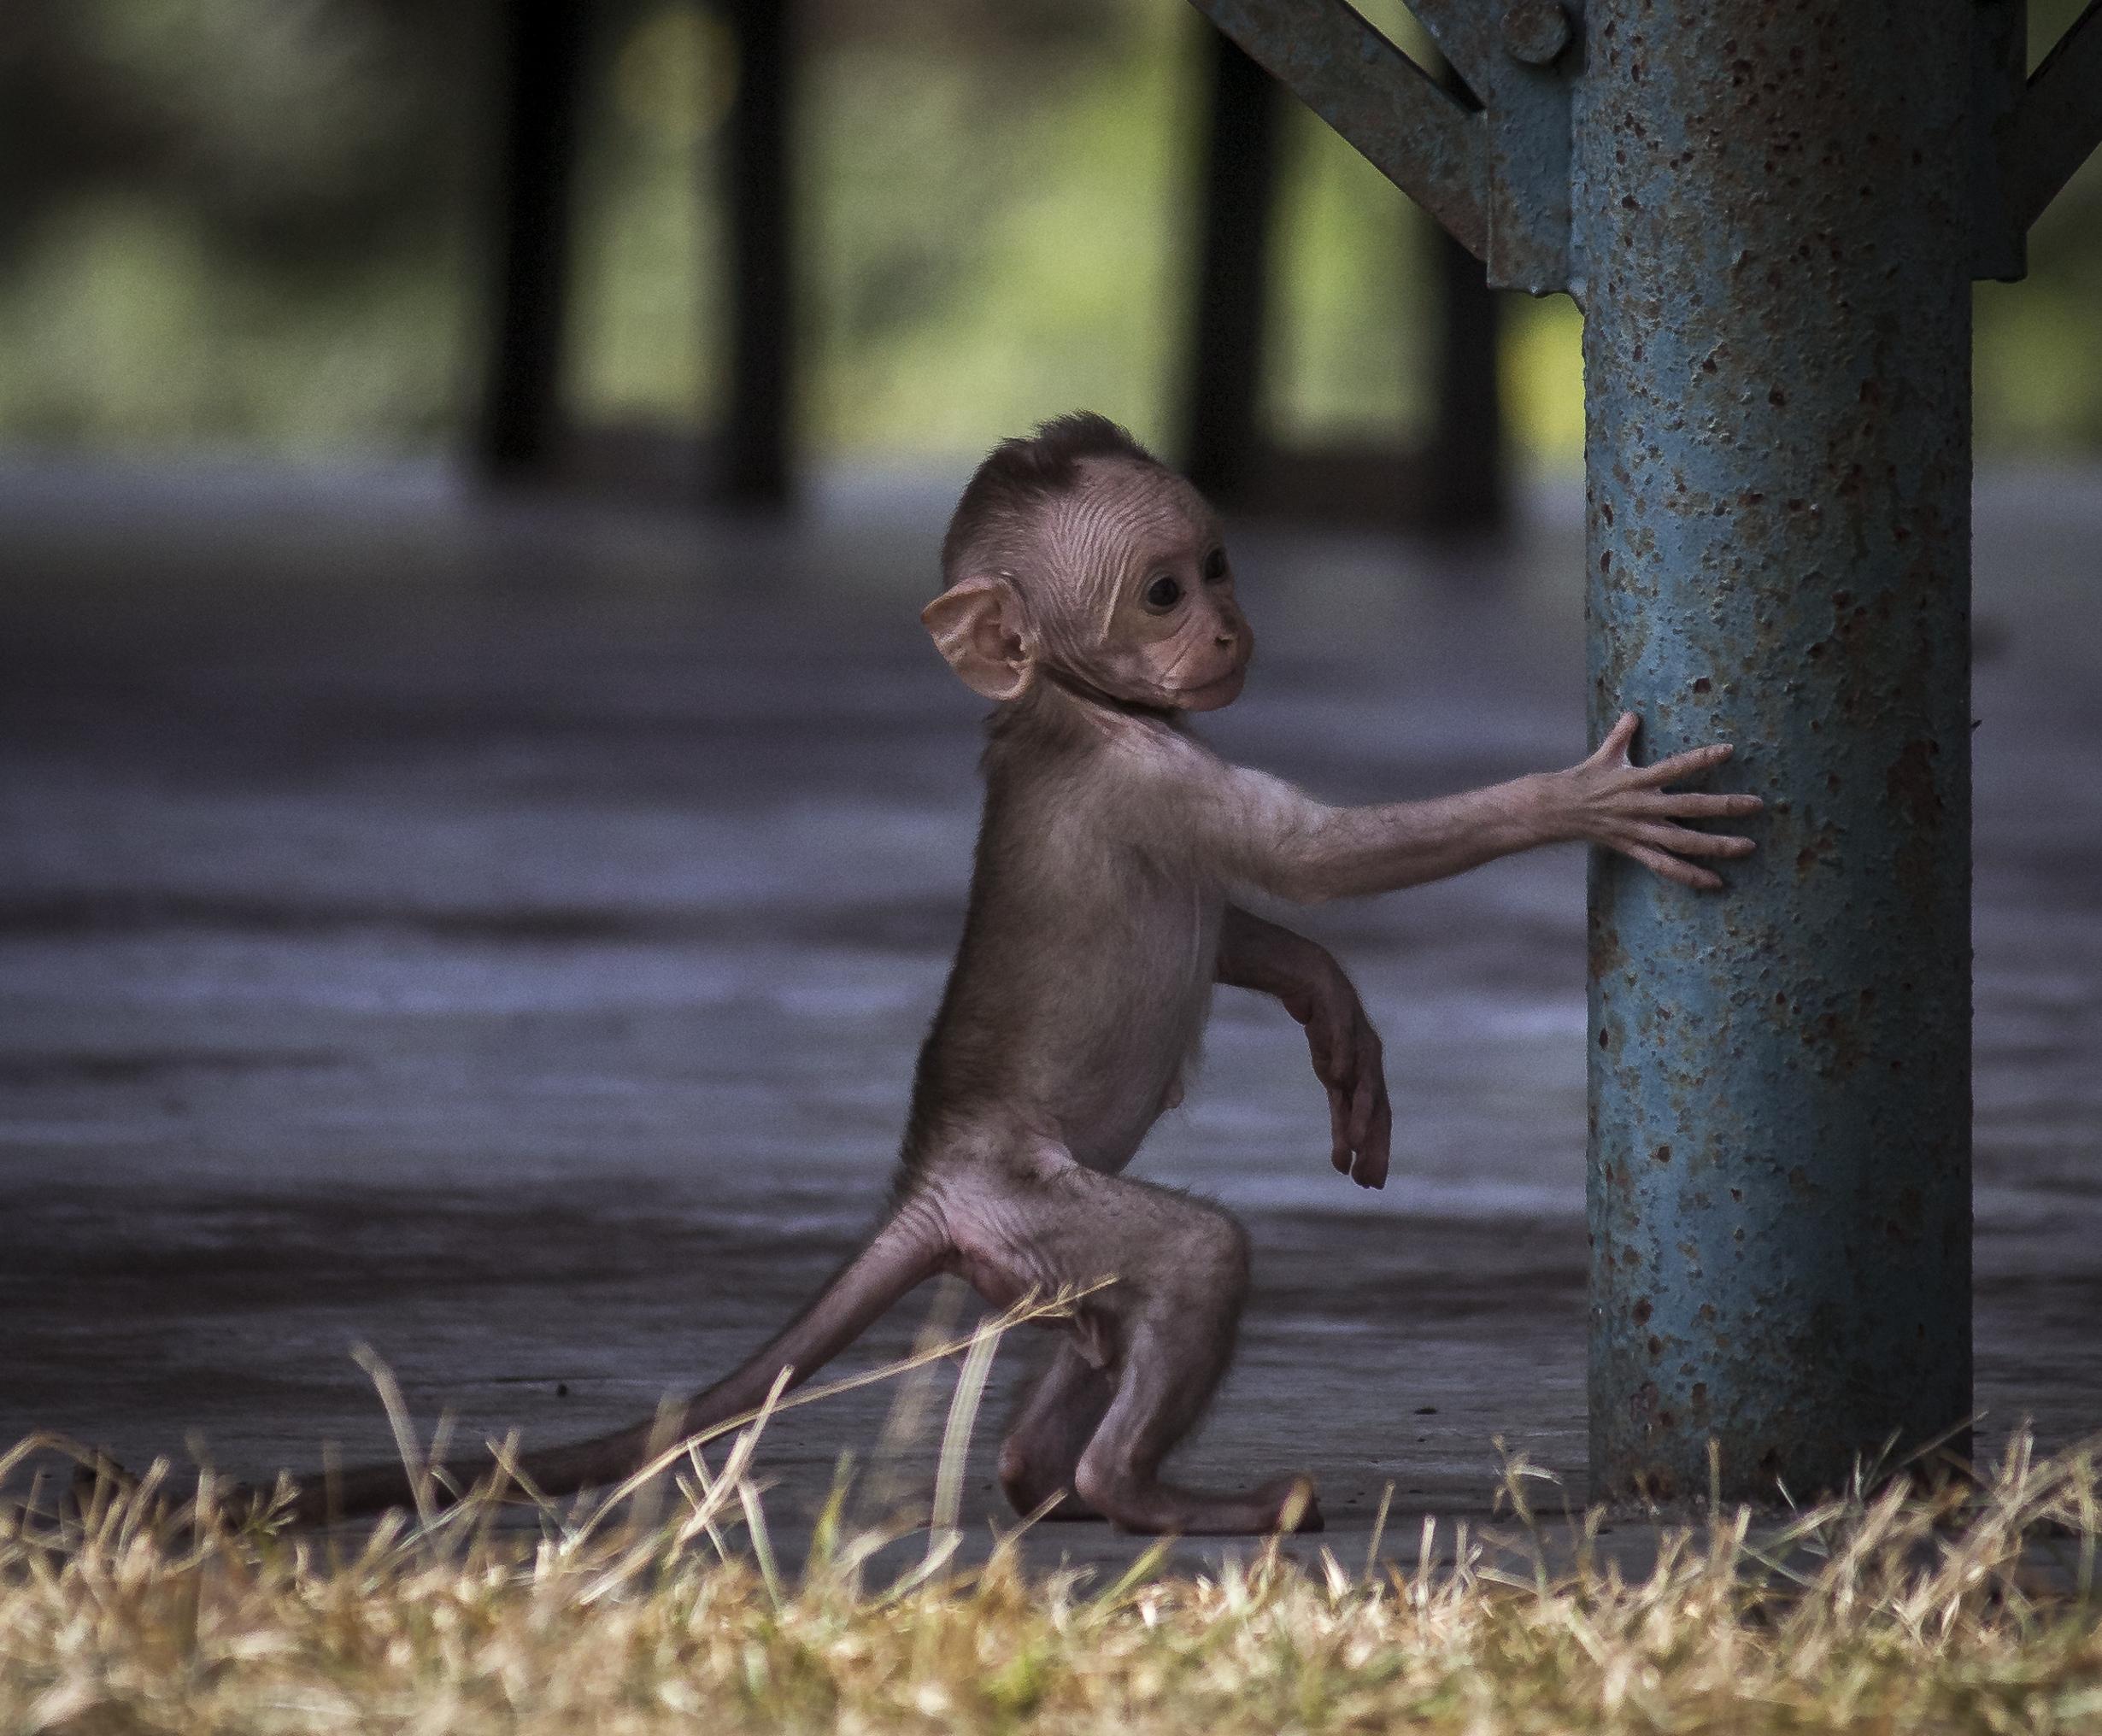 A baby monkey near a pole